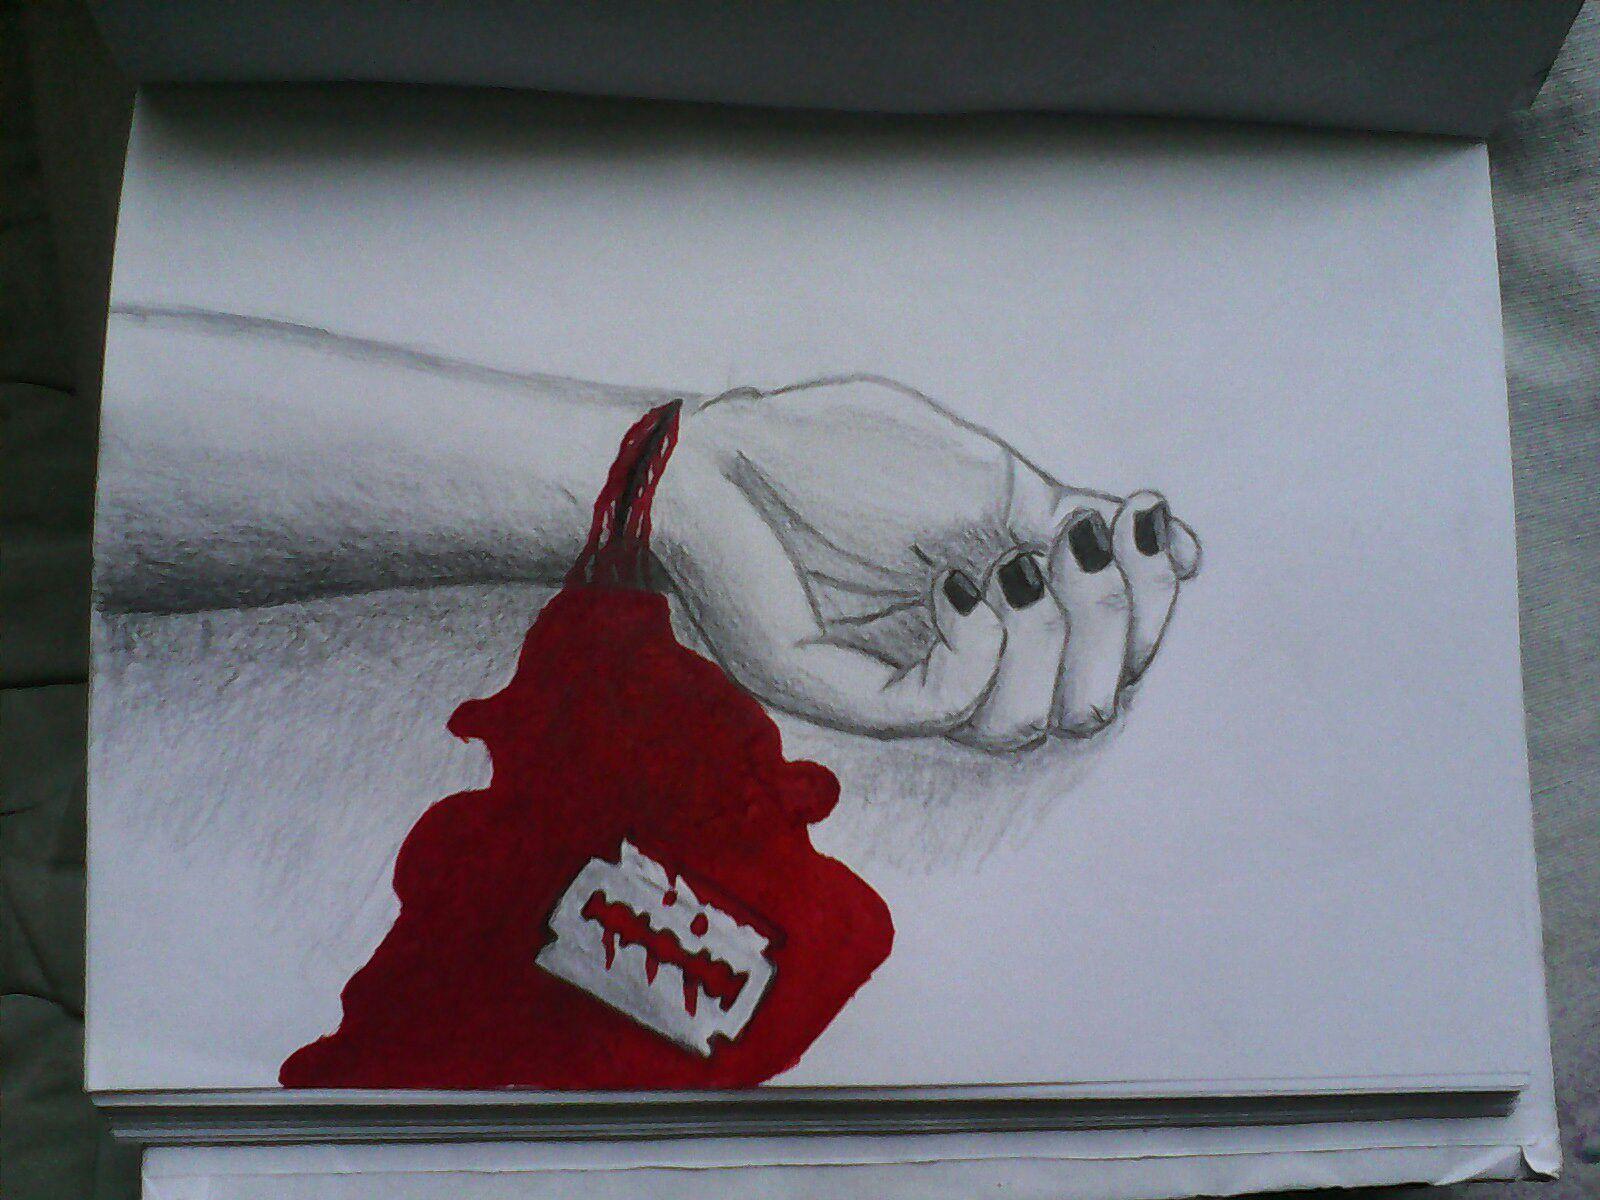 Dalsi Muj Konicek Kresleni Kdyz Me Prepada Deprese Wattpad